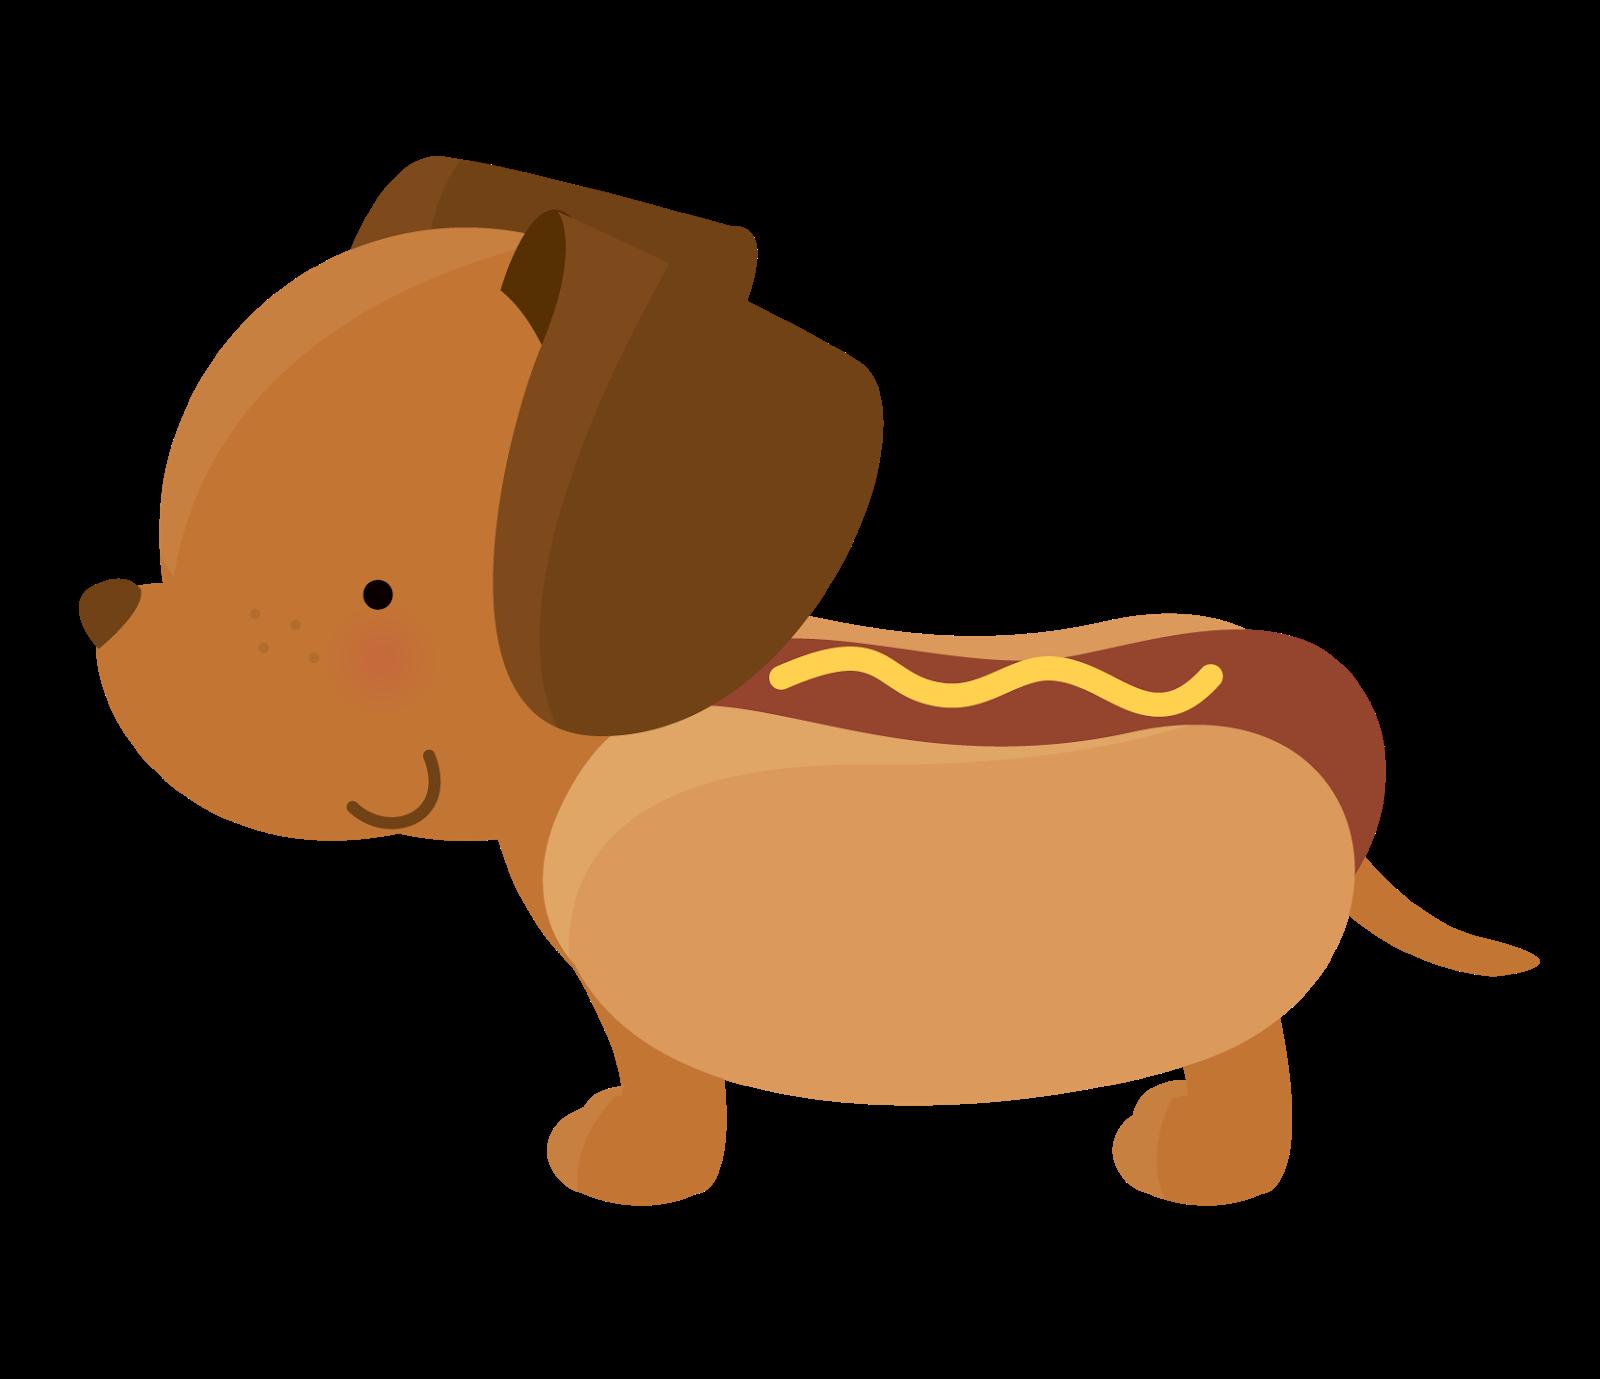 free chili dog clipart - photo #36